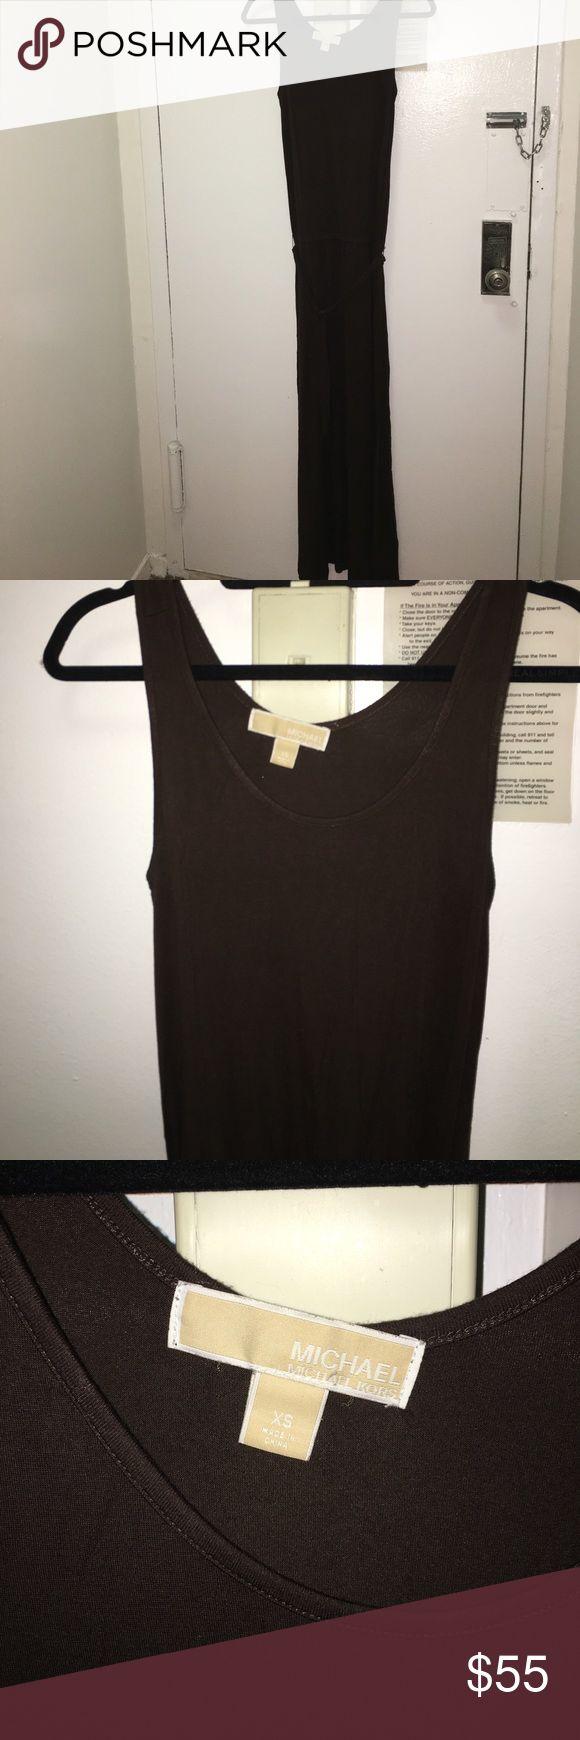 Michael Kota dark brown maxi dress! Michael Korea dark brown maxi dress. Runs pretty long, sinched at the waist with a tie belt. Cotton material and super comfortable. Michael Kors Dresses Maxi